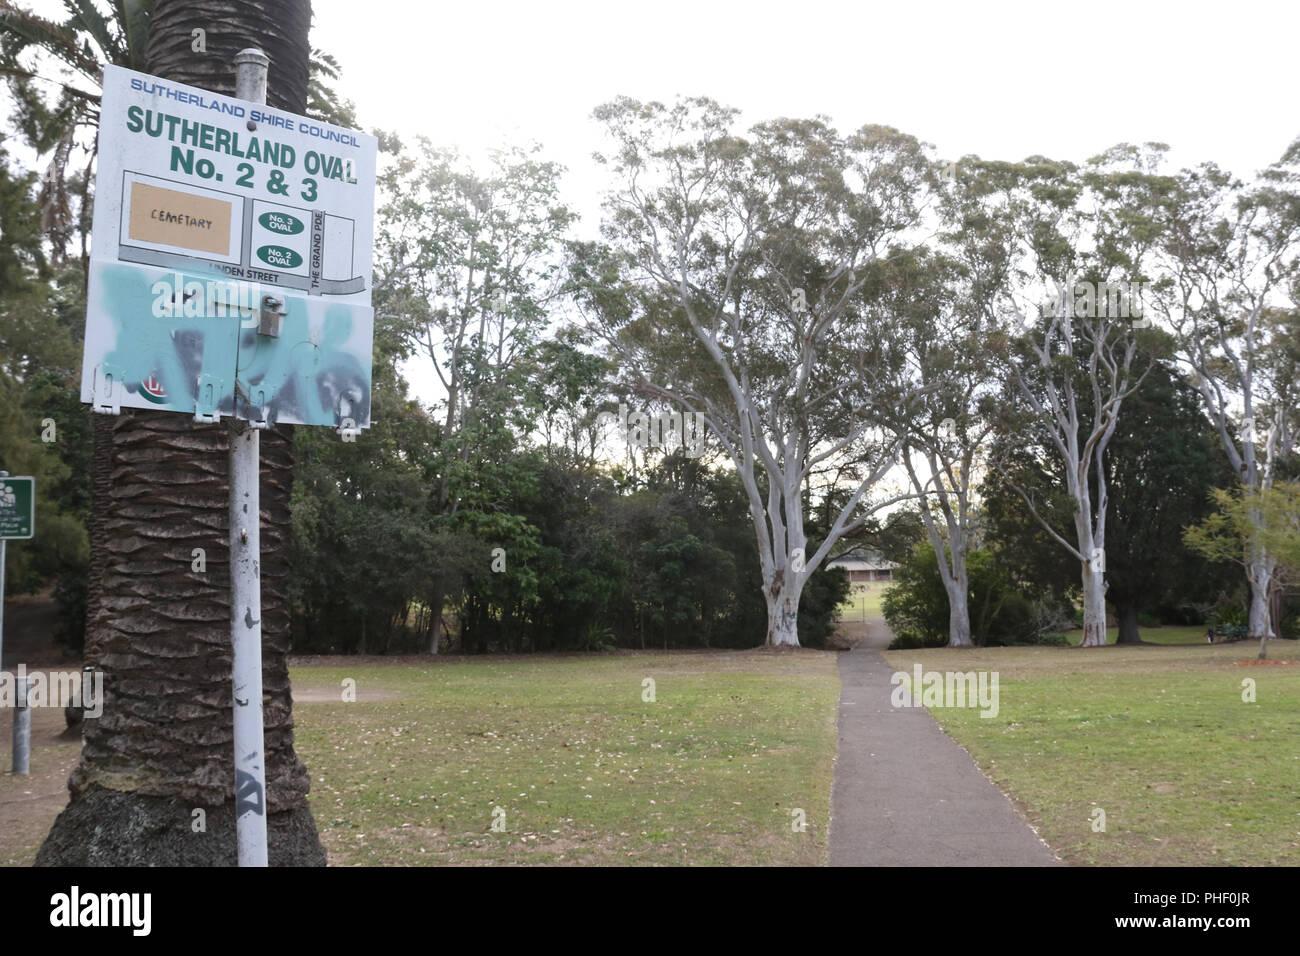 Sutherland Park, Sutherland, Sutherlandshire, NSW, Australia Stock Photo